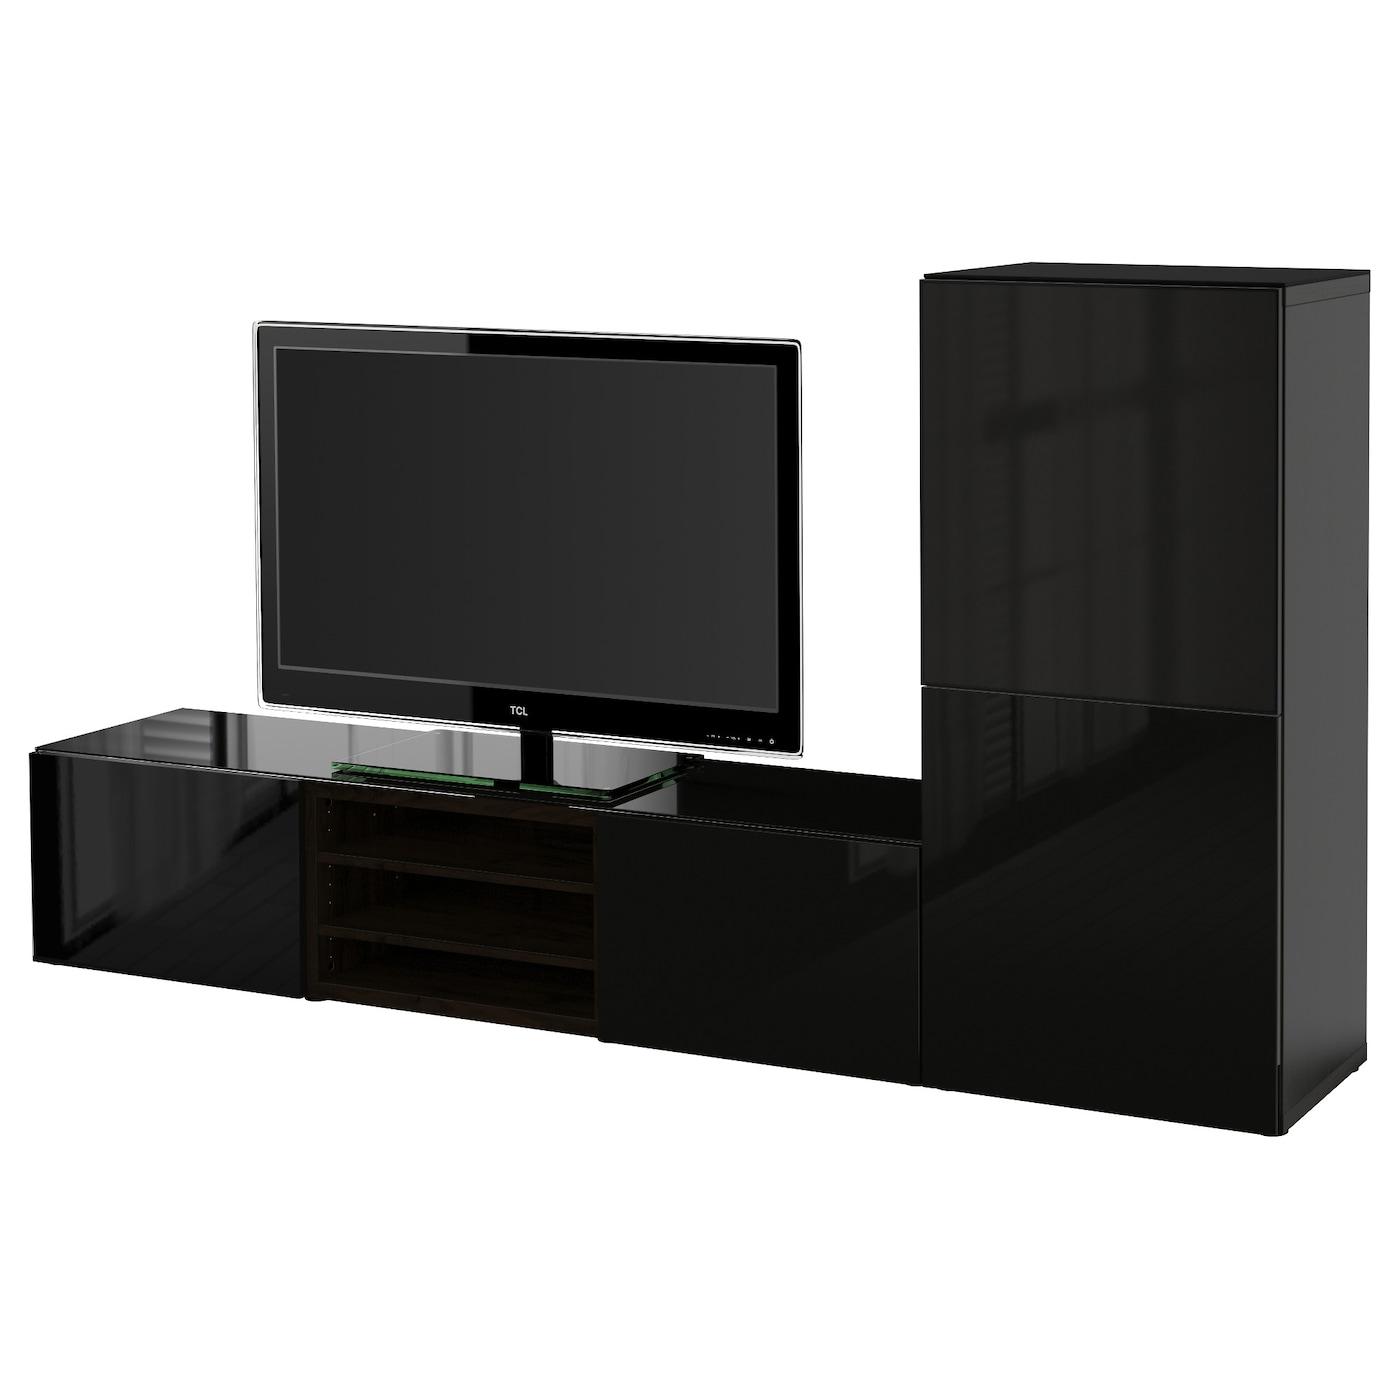 159 Ikea Besta Boas Tv Stand: TV Stands & TV Units